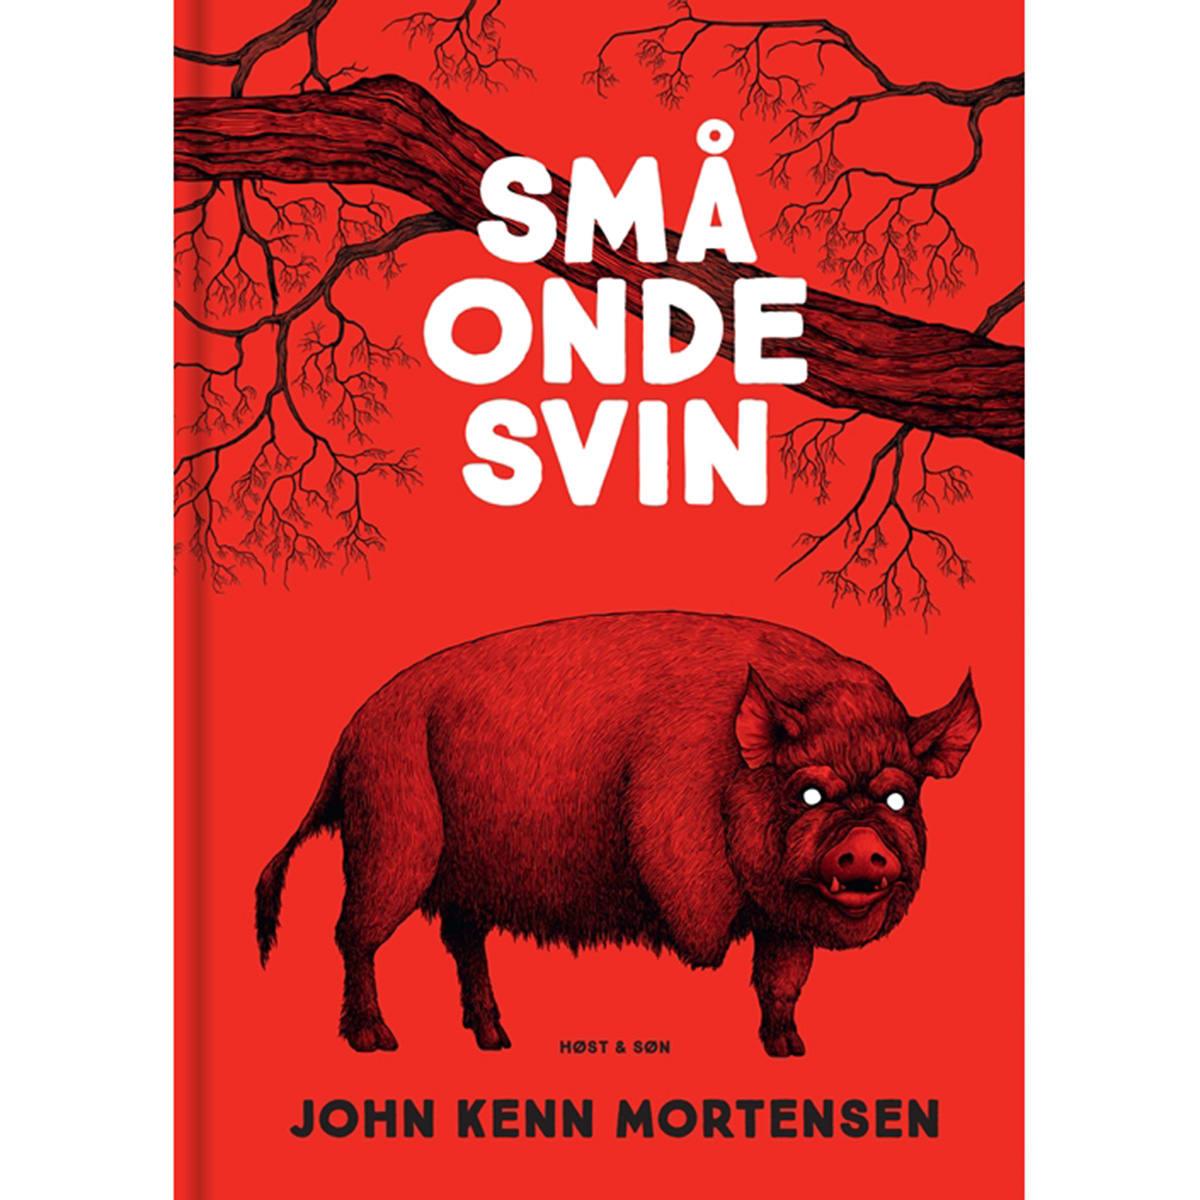 Af John Kenn Mortensen